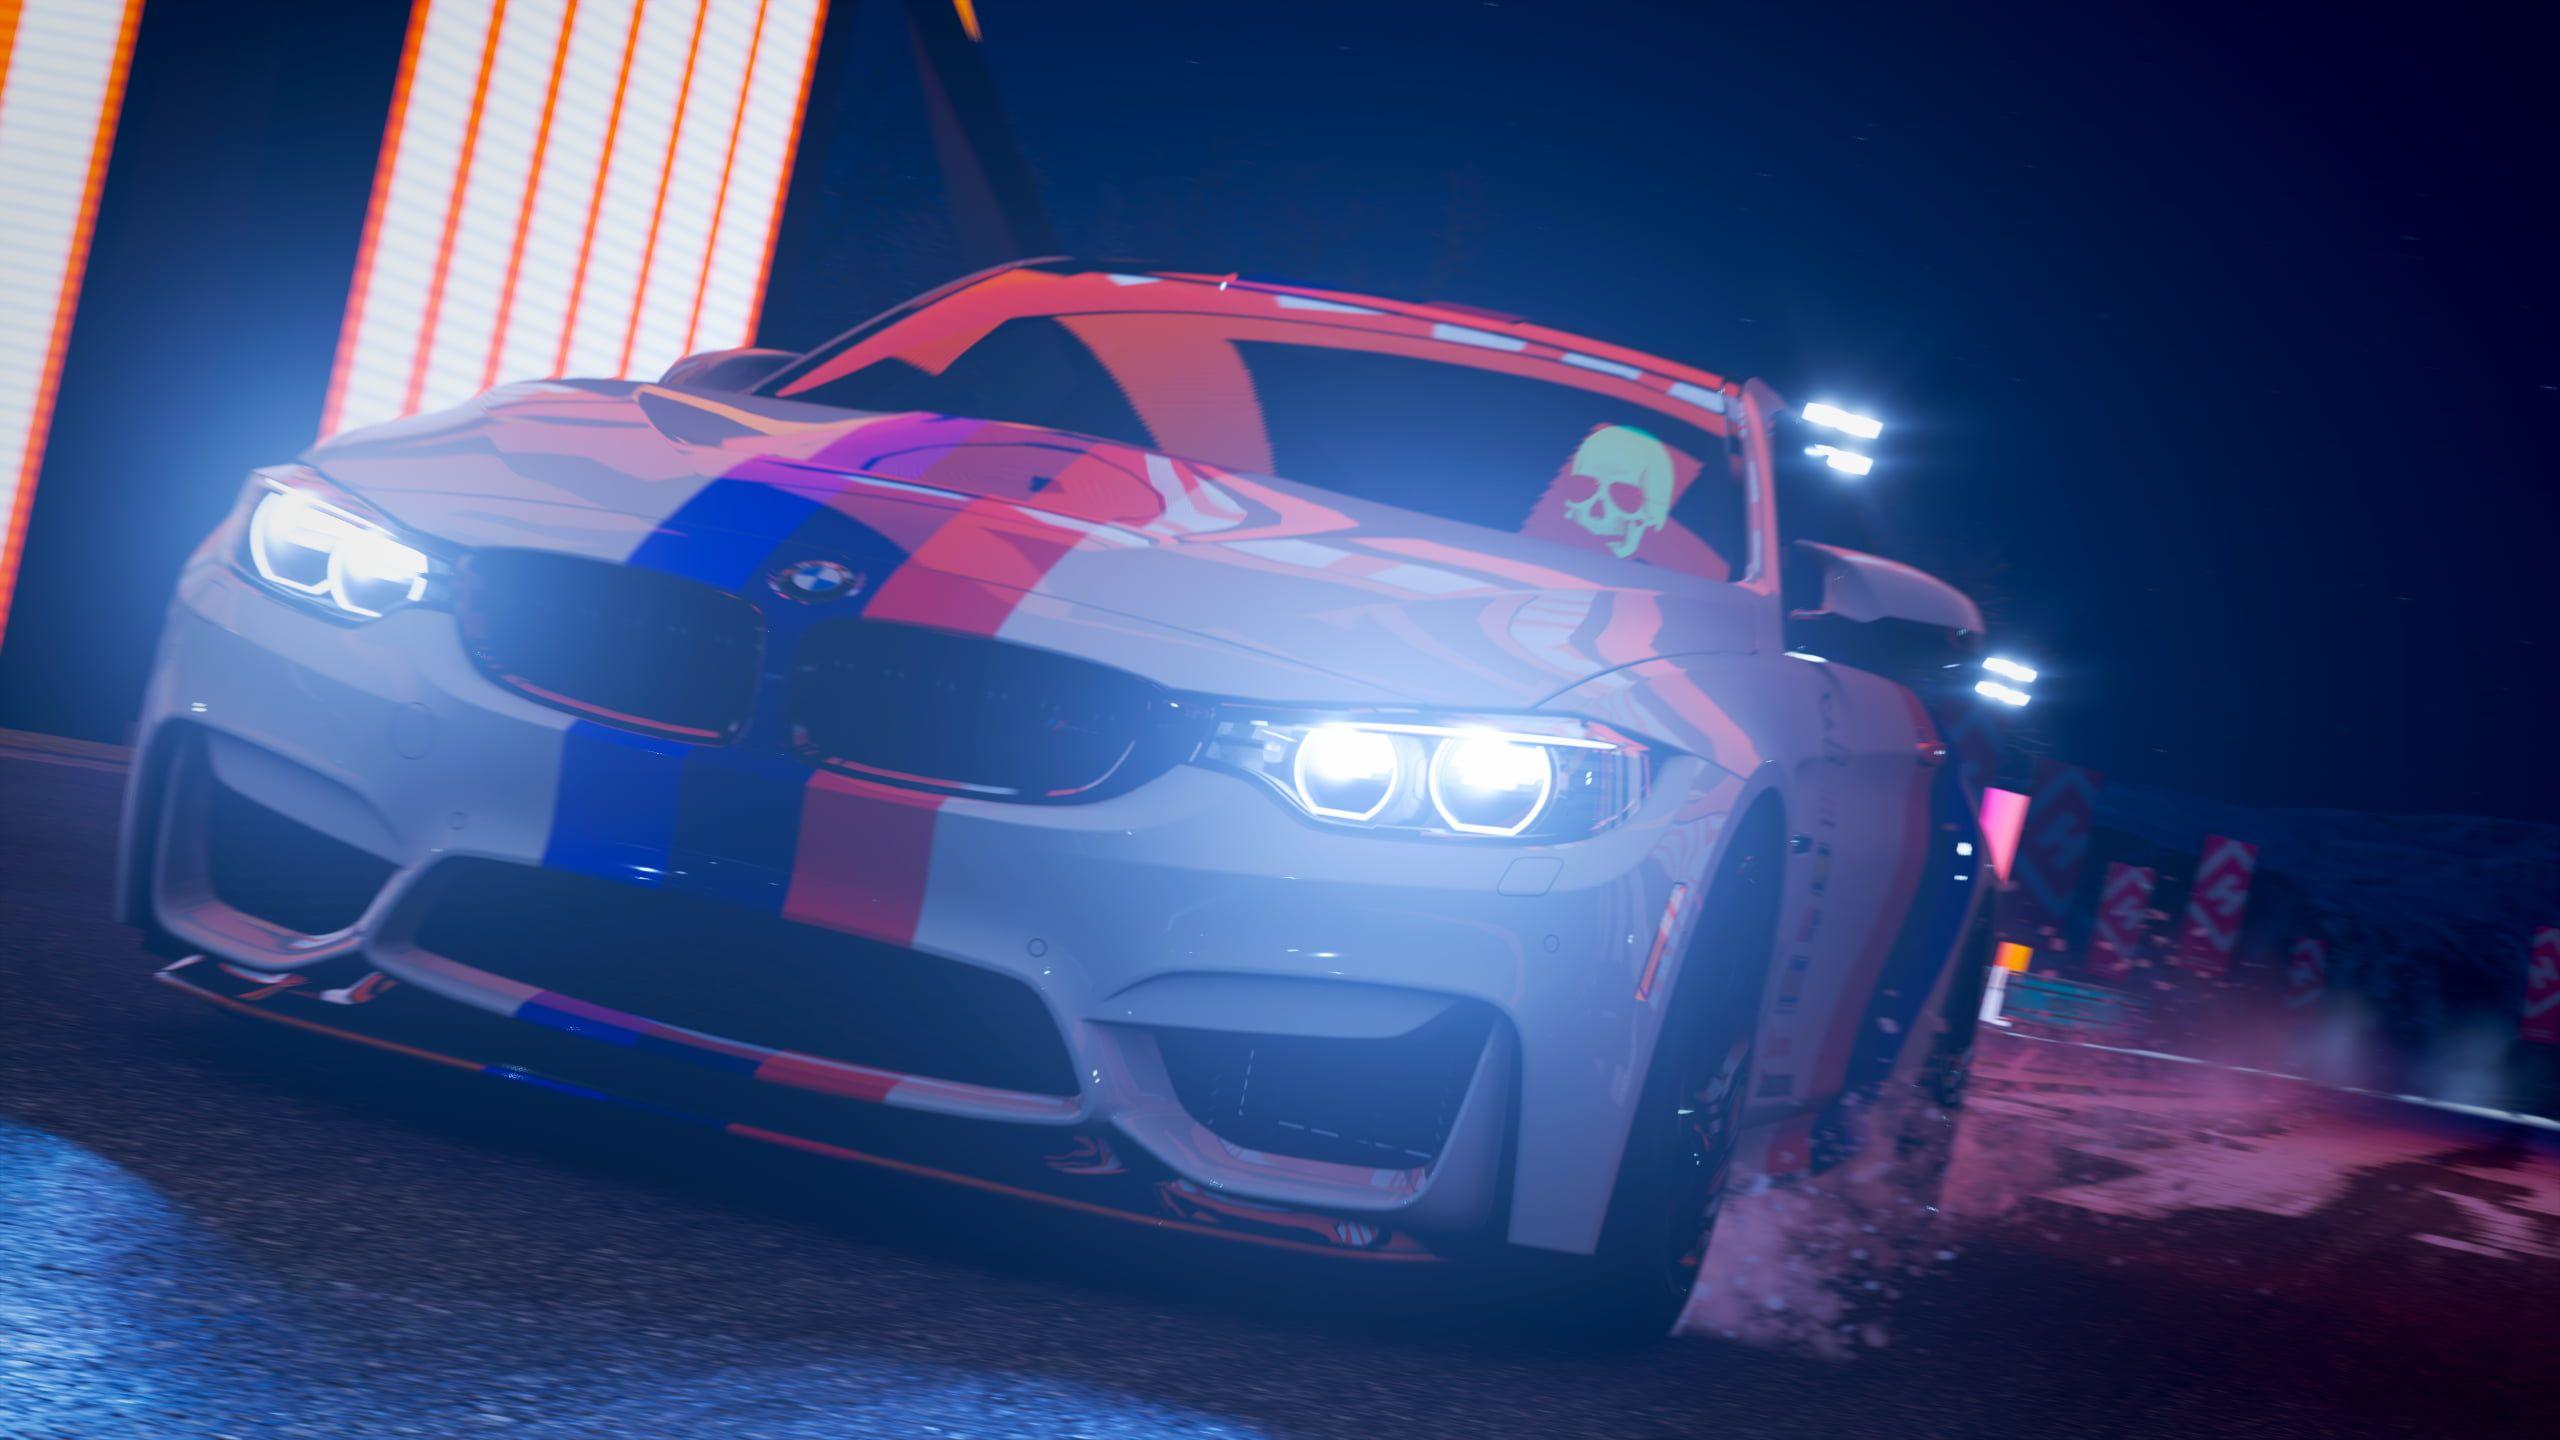 Car Night Led Headlight Bmw Bmw M4 M4 Vehicle Video Games Forza Forza Games Forza Horizon Forza Horizon 4 2k Wallpaper Hdwallpape Bmw M4 Bmw Car Night